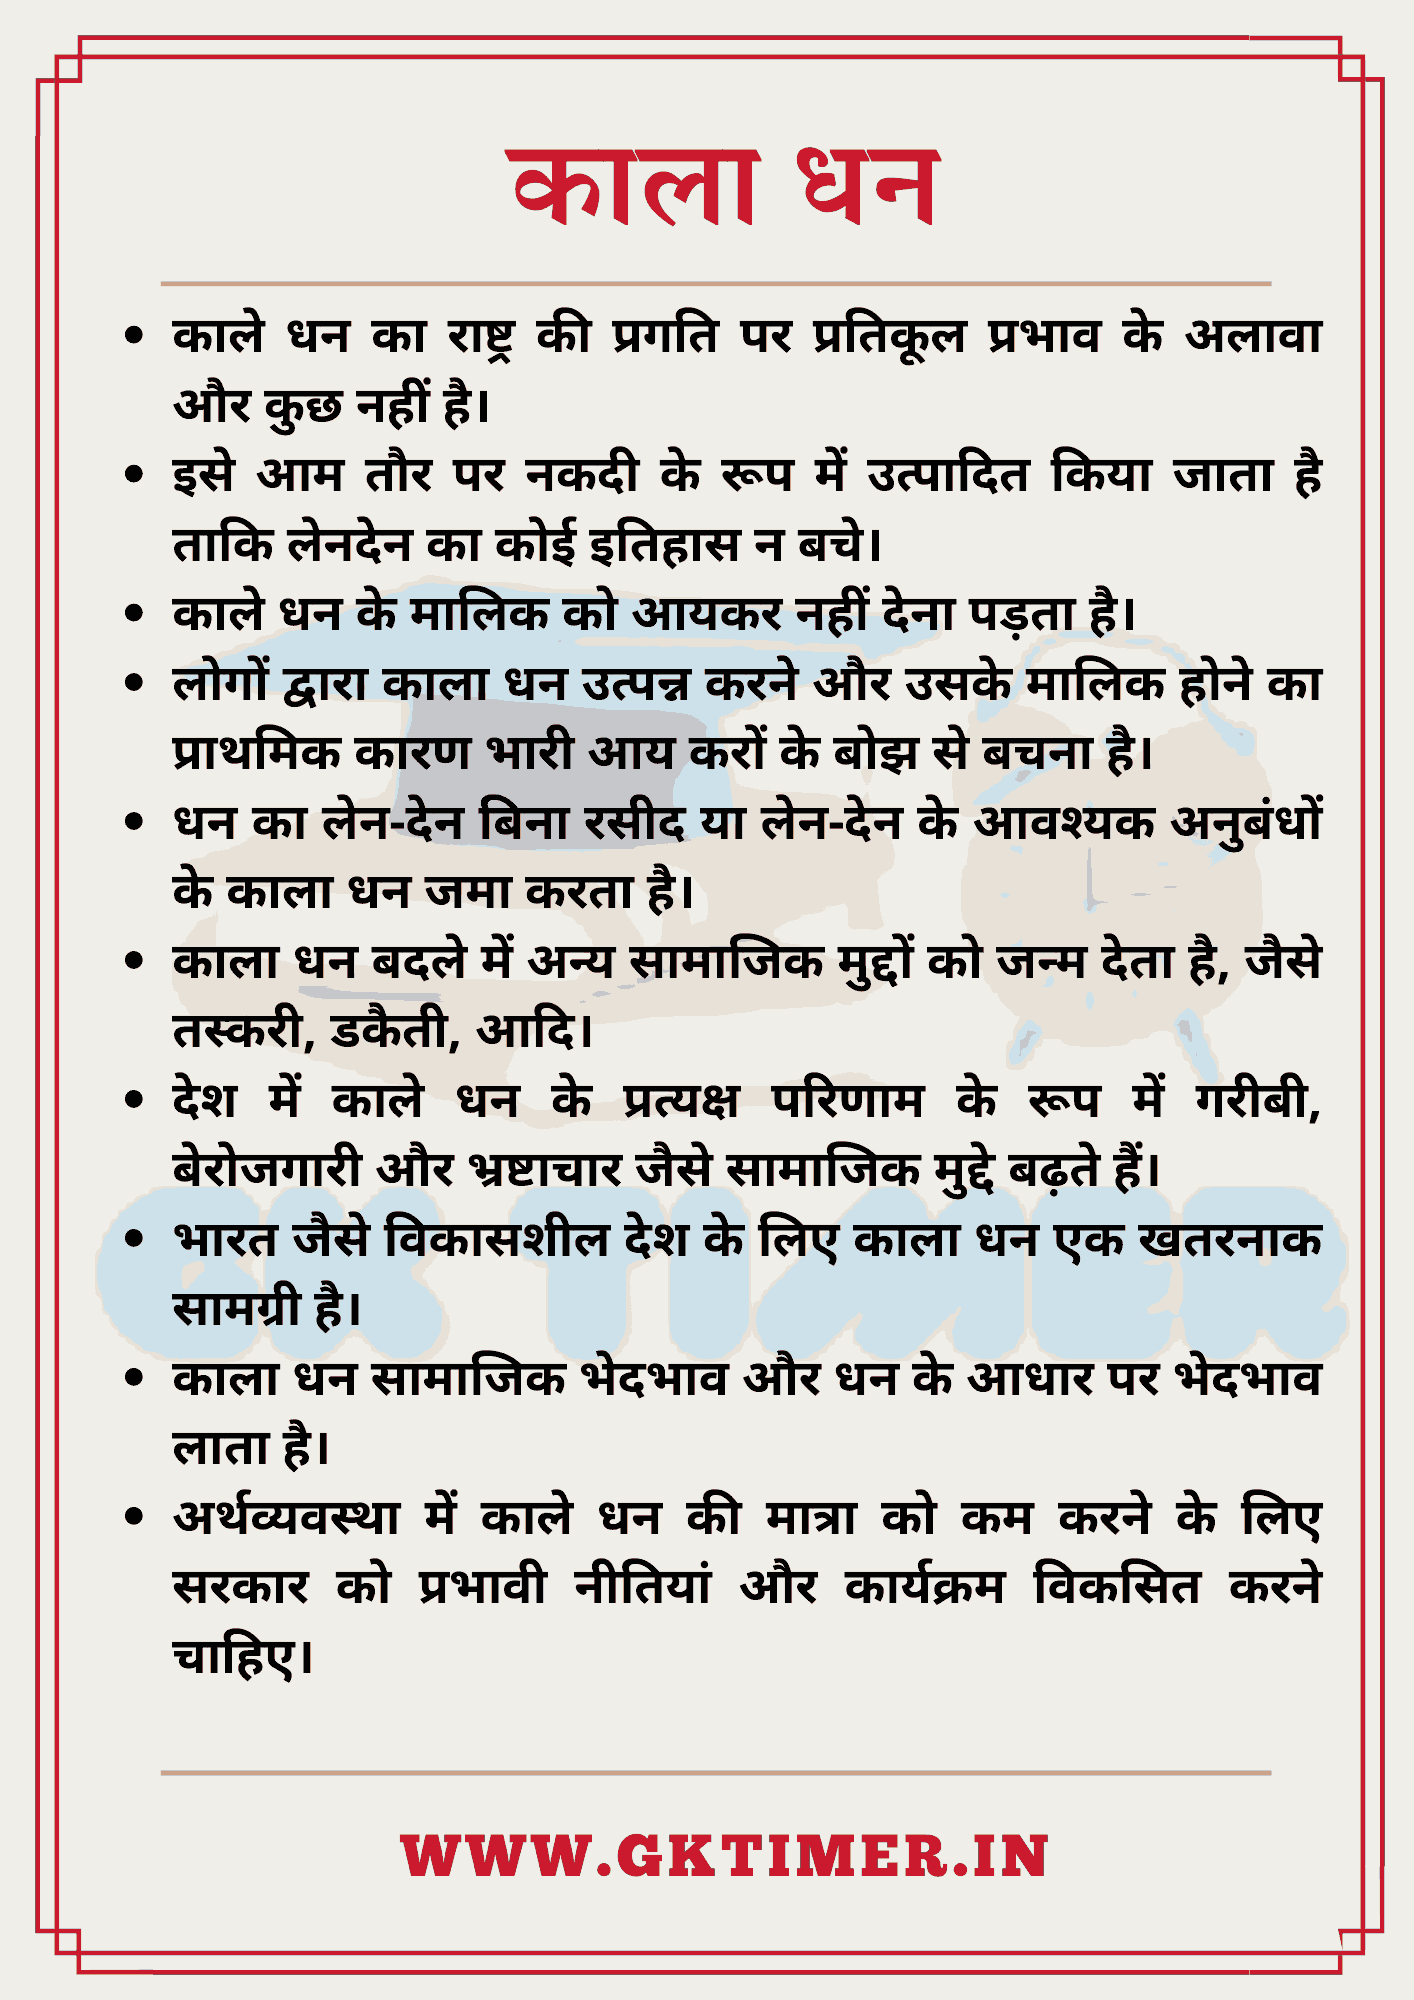 काले धन पर निबंध   Long & Short Essay on Black Money in Hindi   10 Lines on Black Money in Hindi